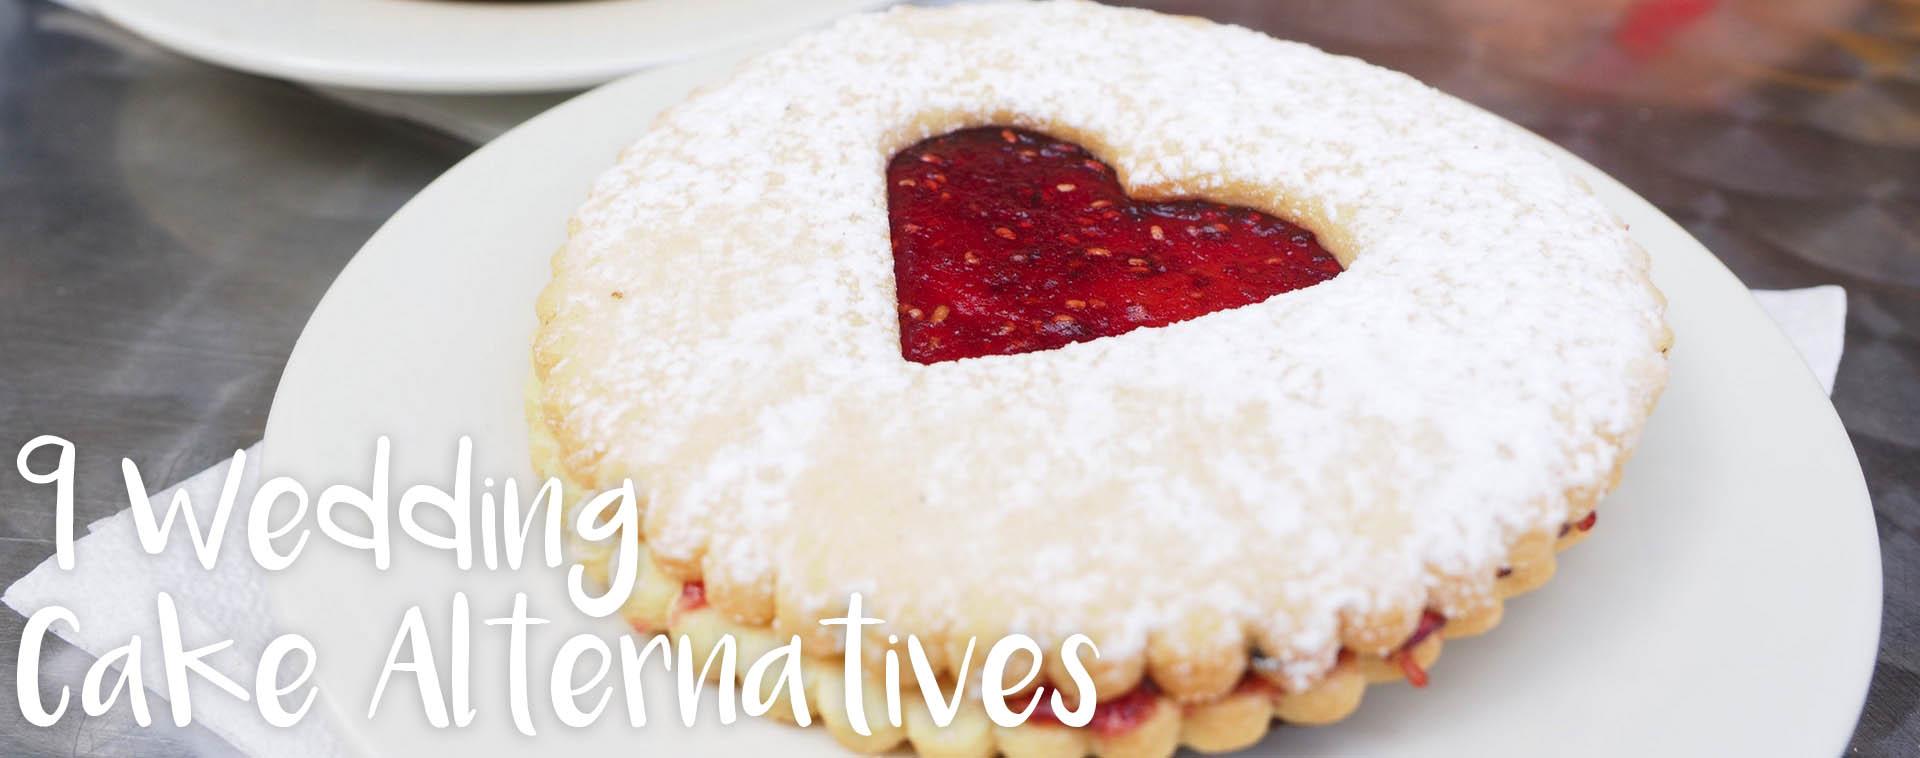 9 Wedding Cake Alternatives - KeelyBurns Blog